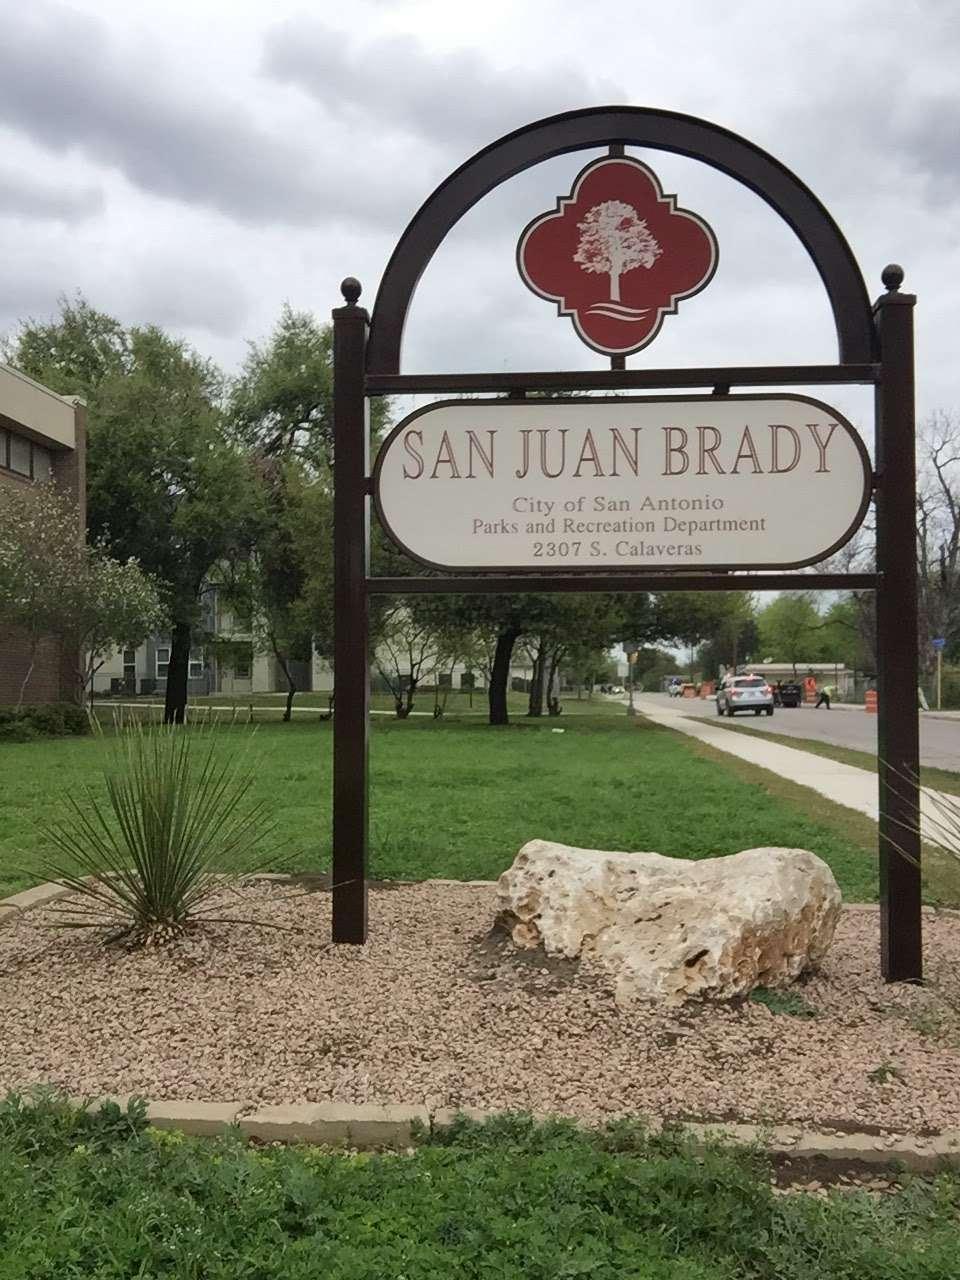 San Juan Brady Park - park    Photo 1 of 9   Address: 2307 S Calaveras St, San Antonio, TX 78207, USA   Phone: (210) 207-7275